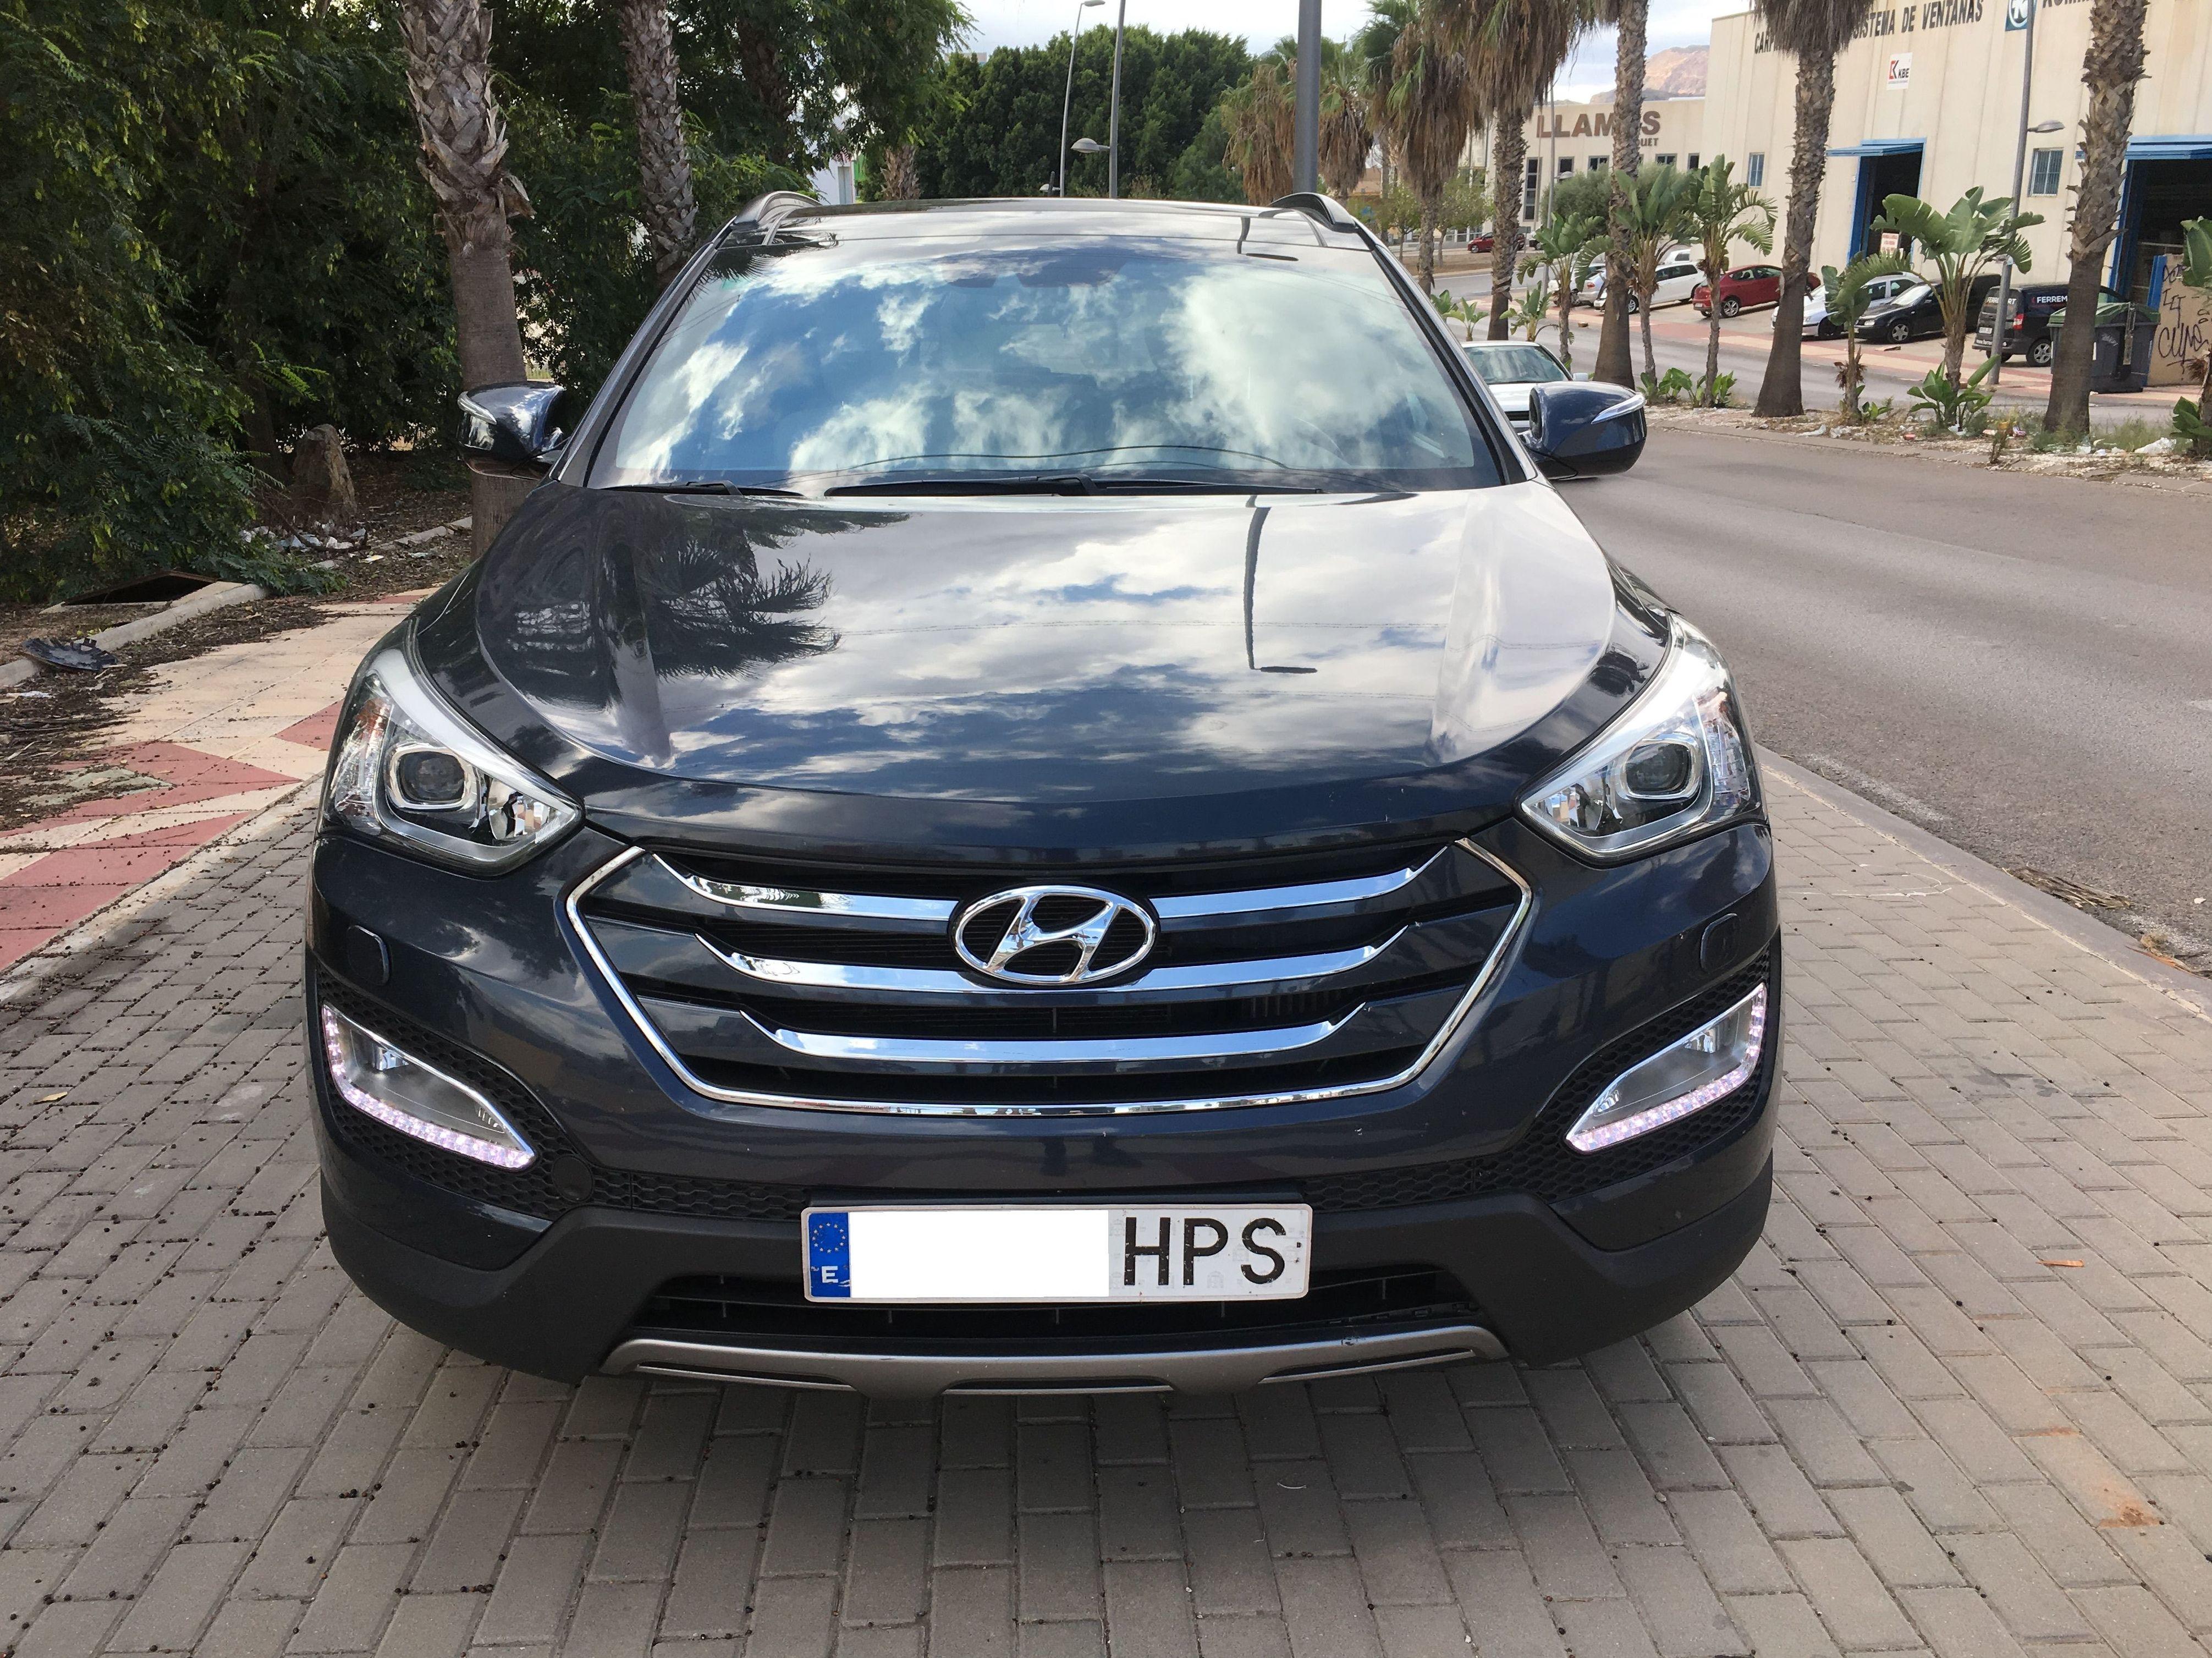 HYUNDAI SANTA FE: COCHES DE OCASION de Navirent-Automóviles Parque Mediterráneo